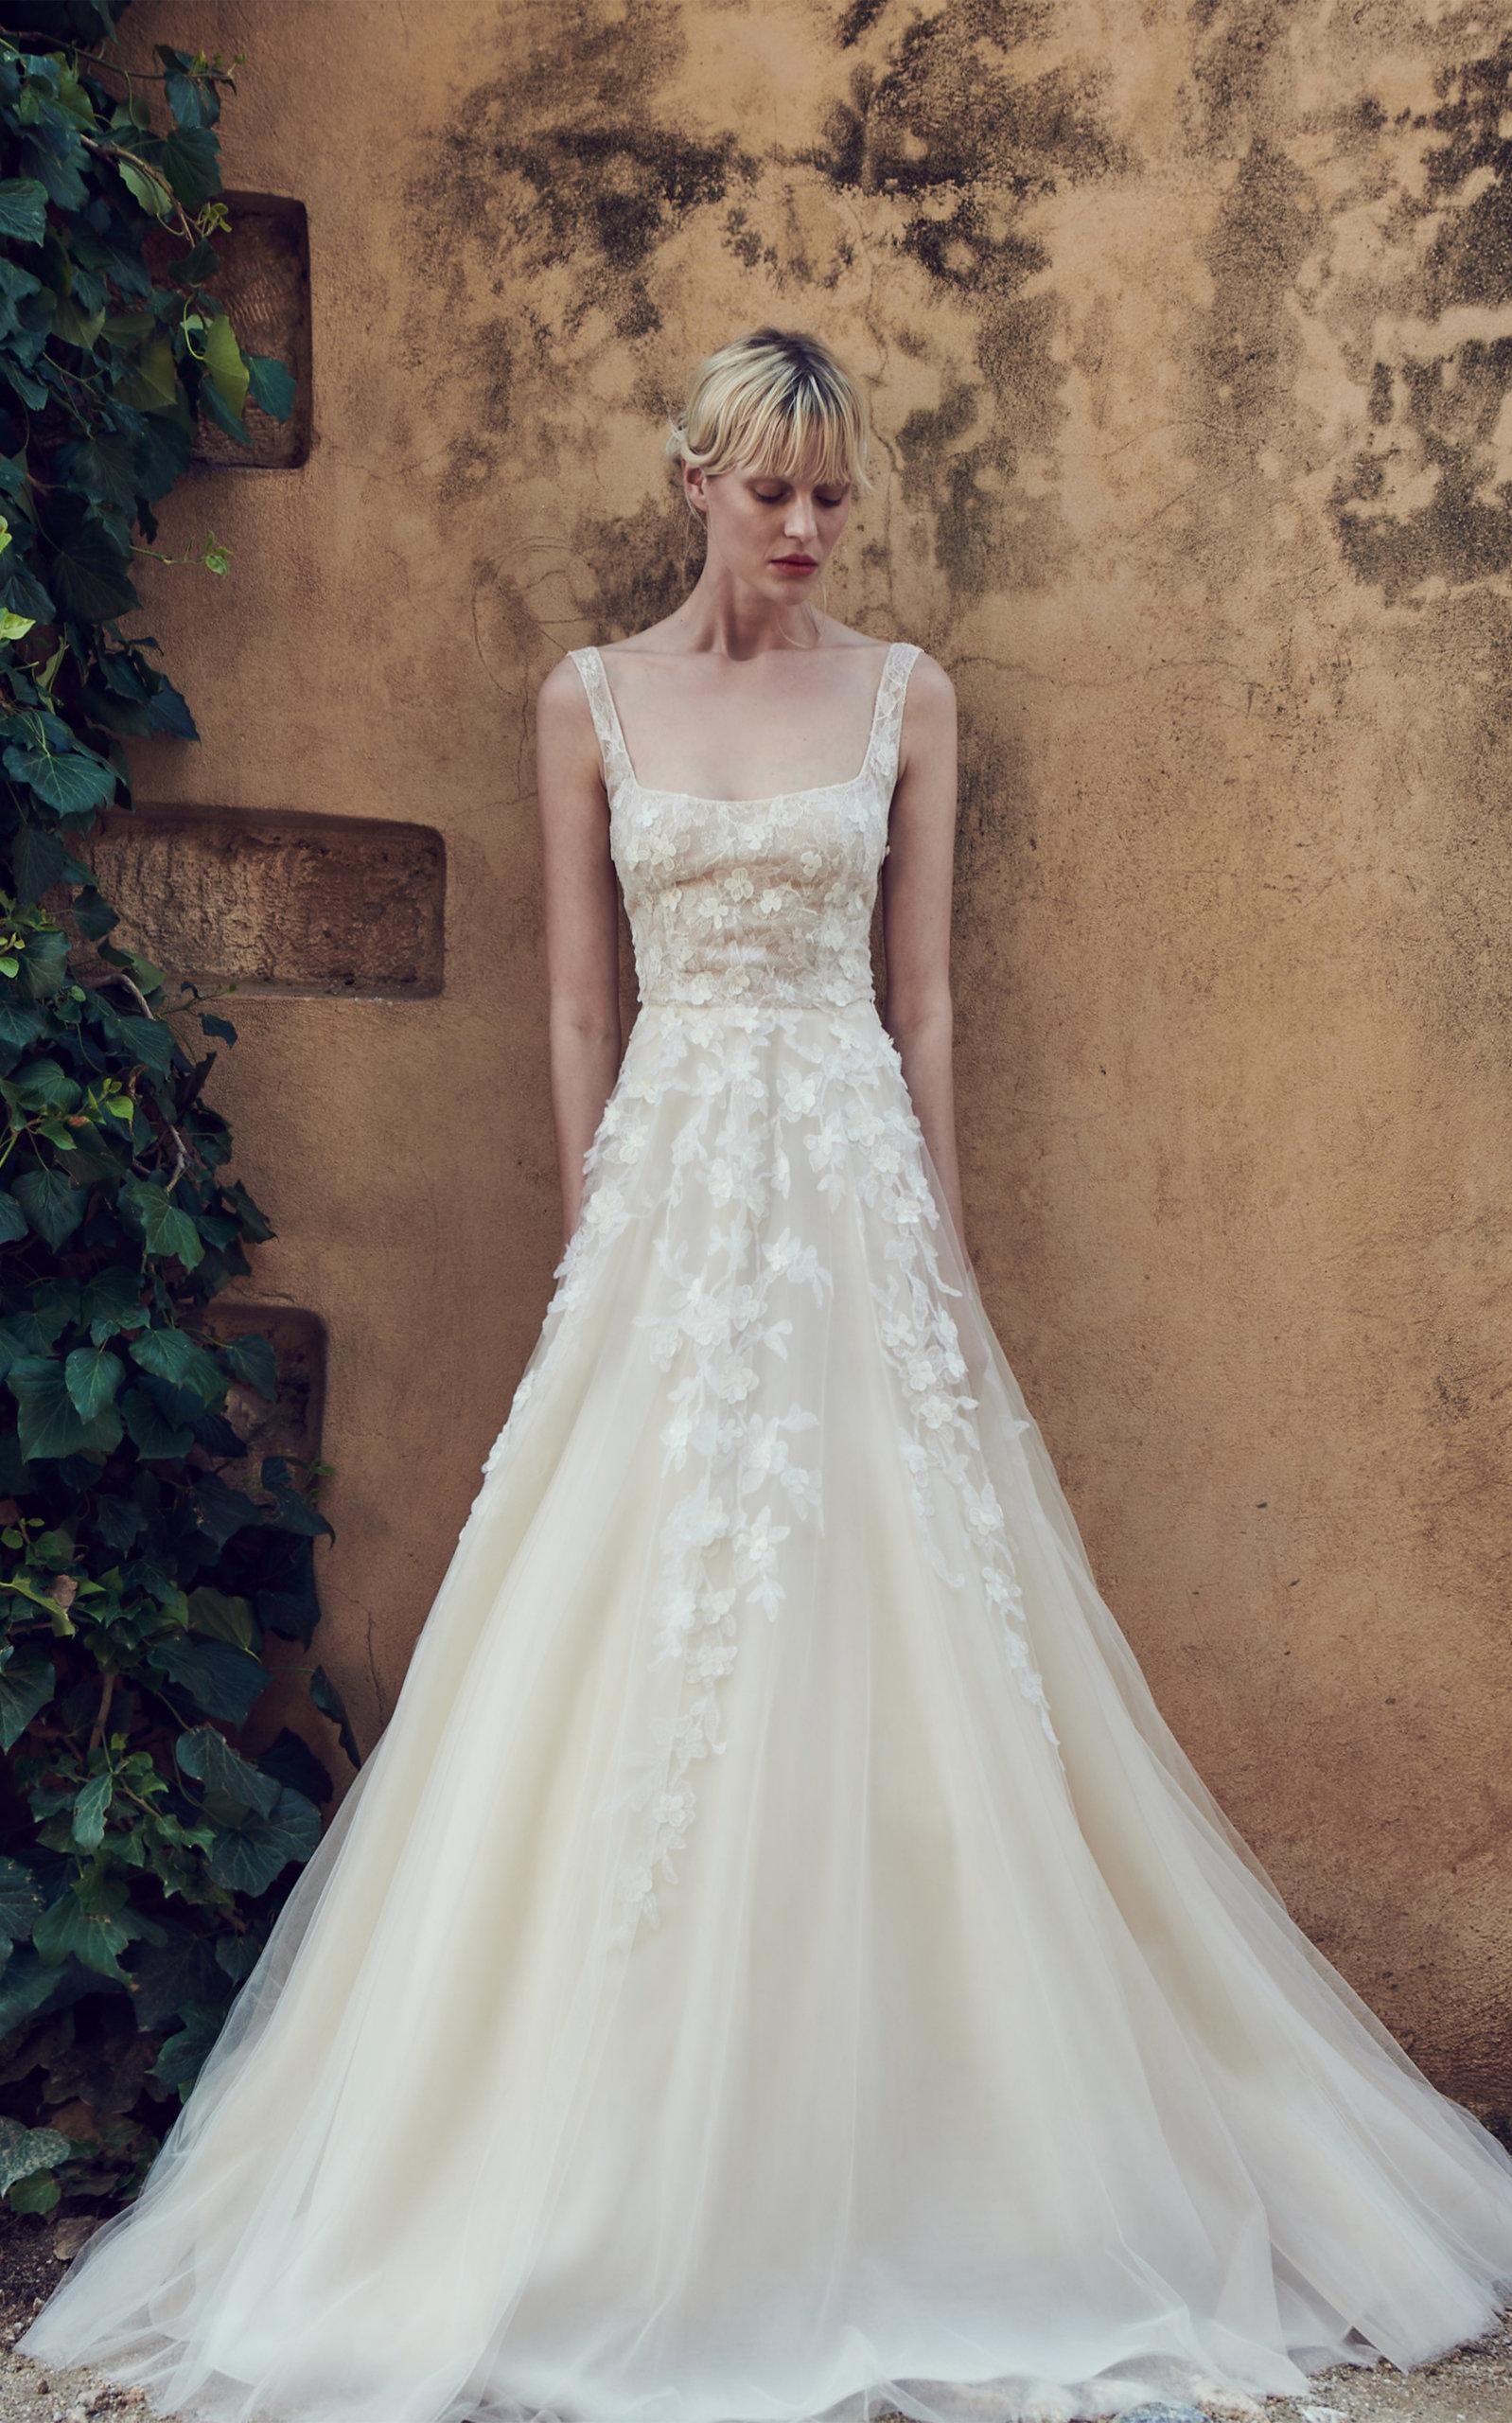 COSTARELLOS BRIDAL Square Neck Tulle Gown in White